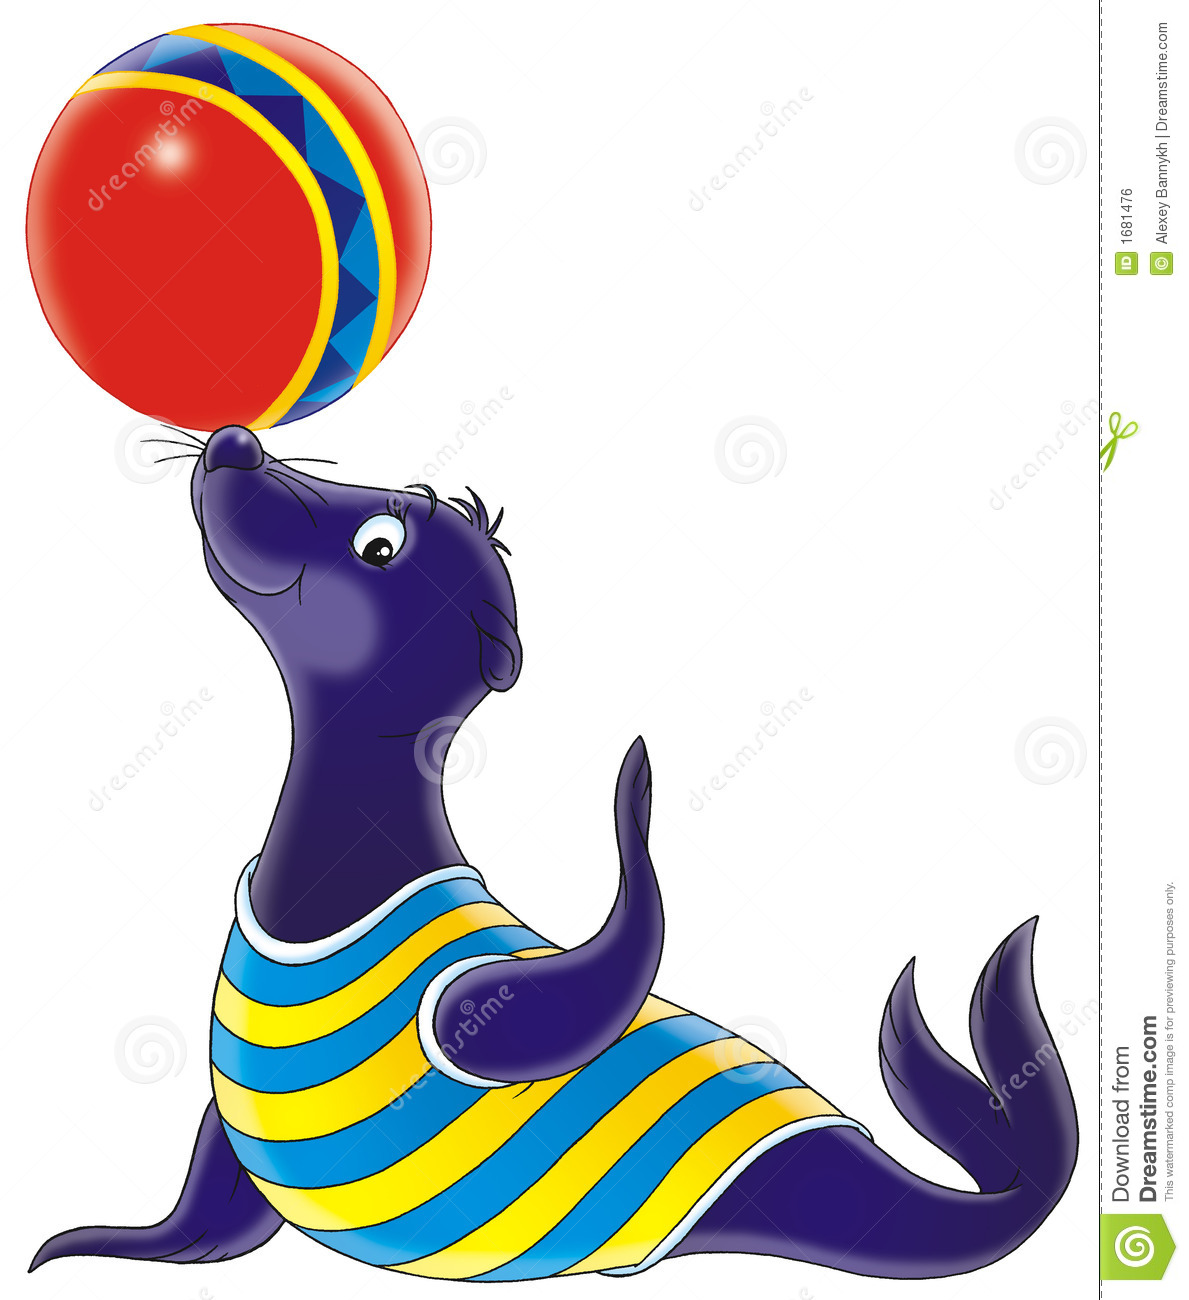 1189x1300 Seal Clipart Circus Tiger 3888203